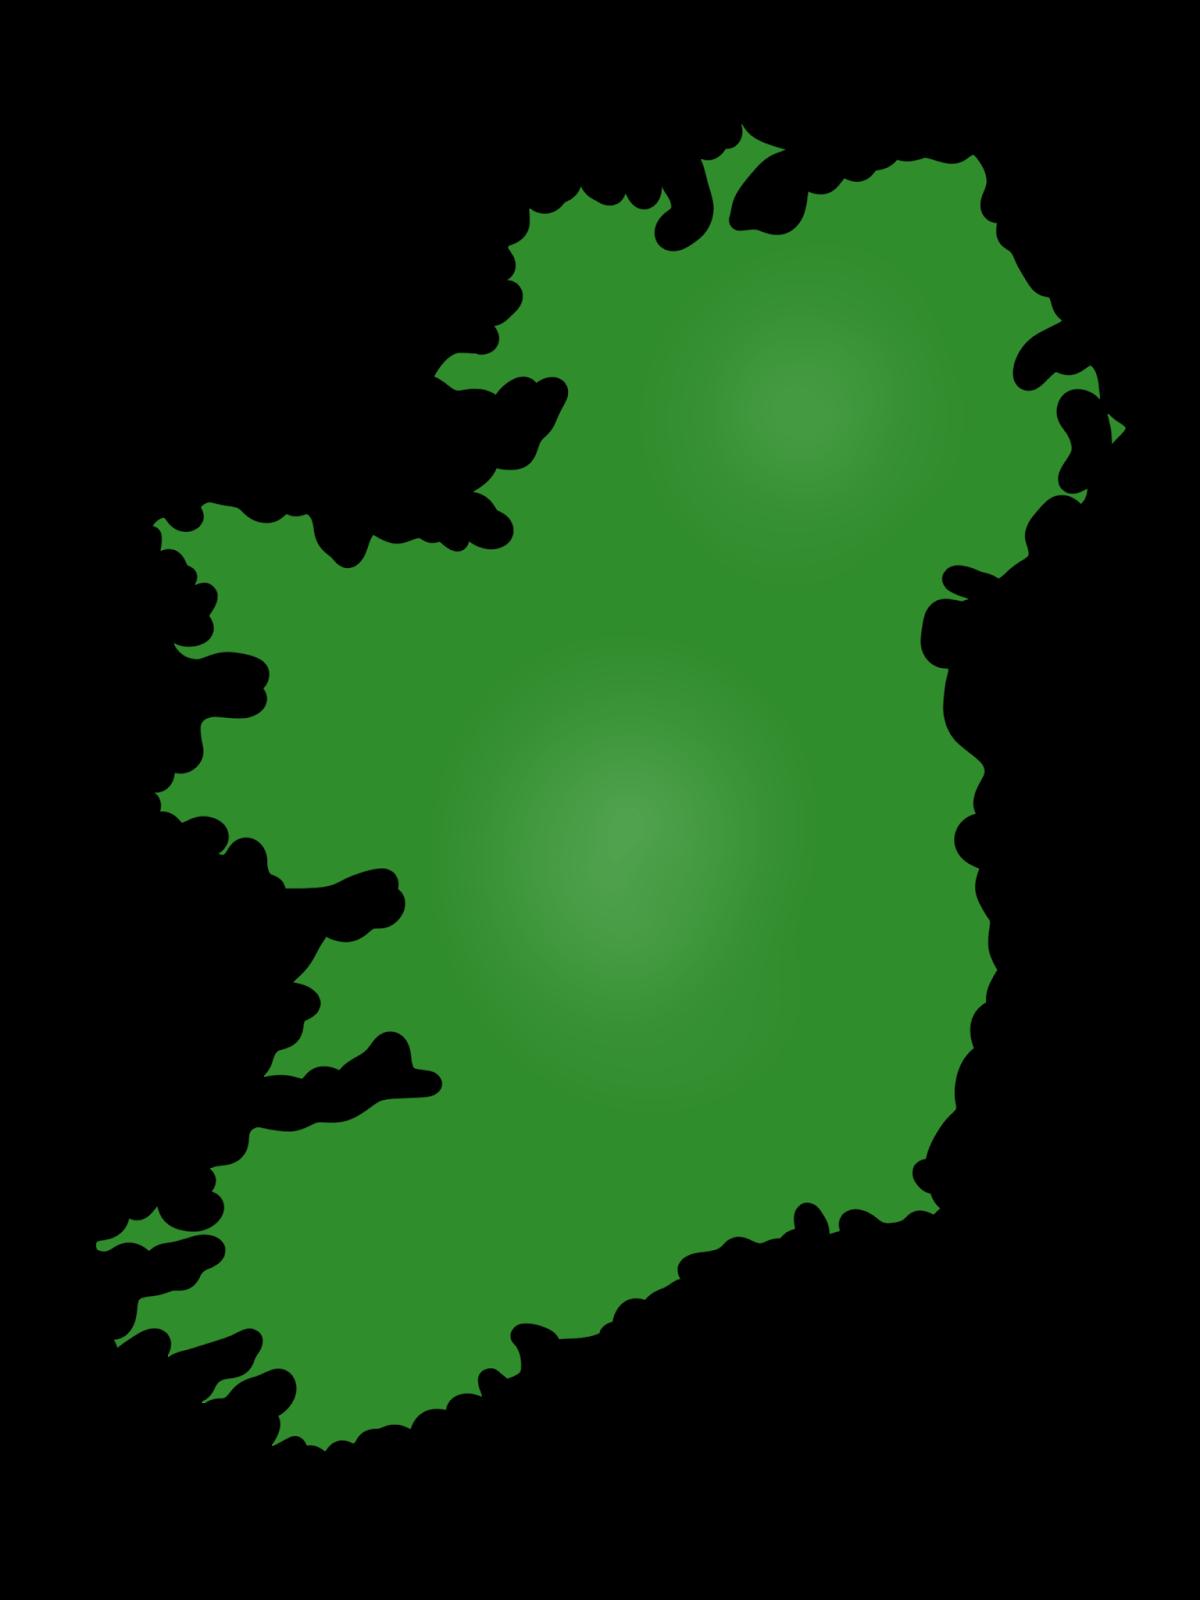 Free clipart ireland. Irish cliparts download clip